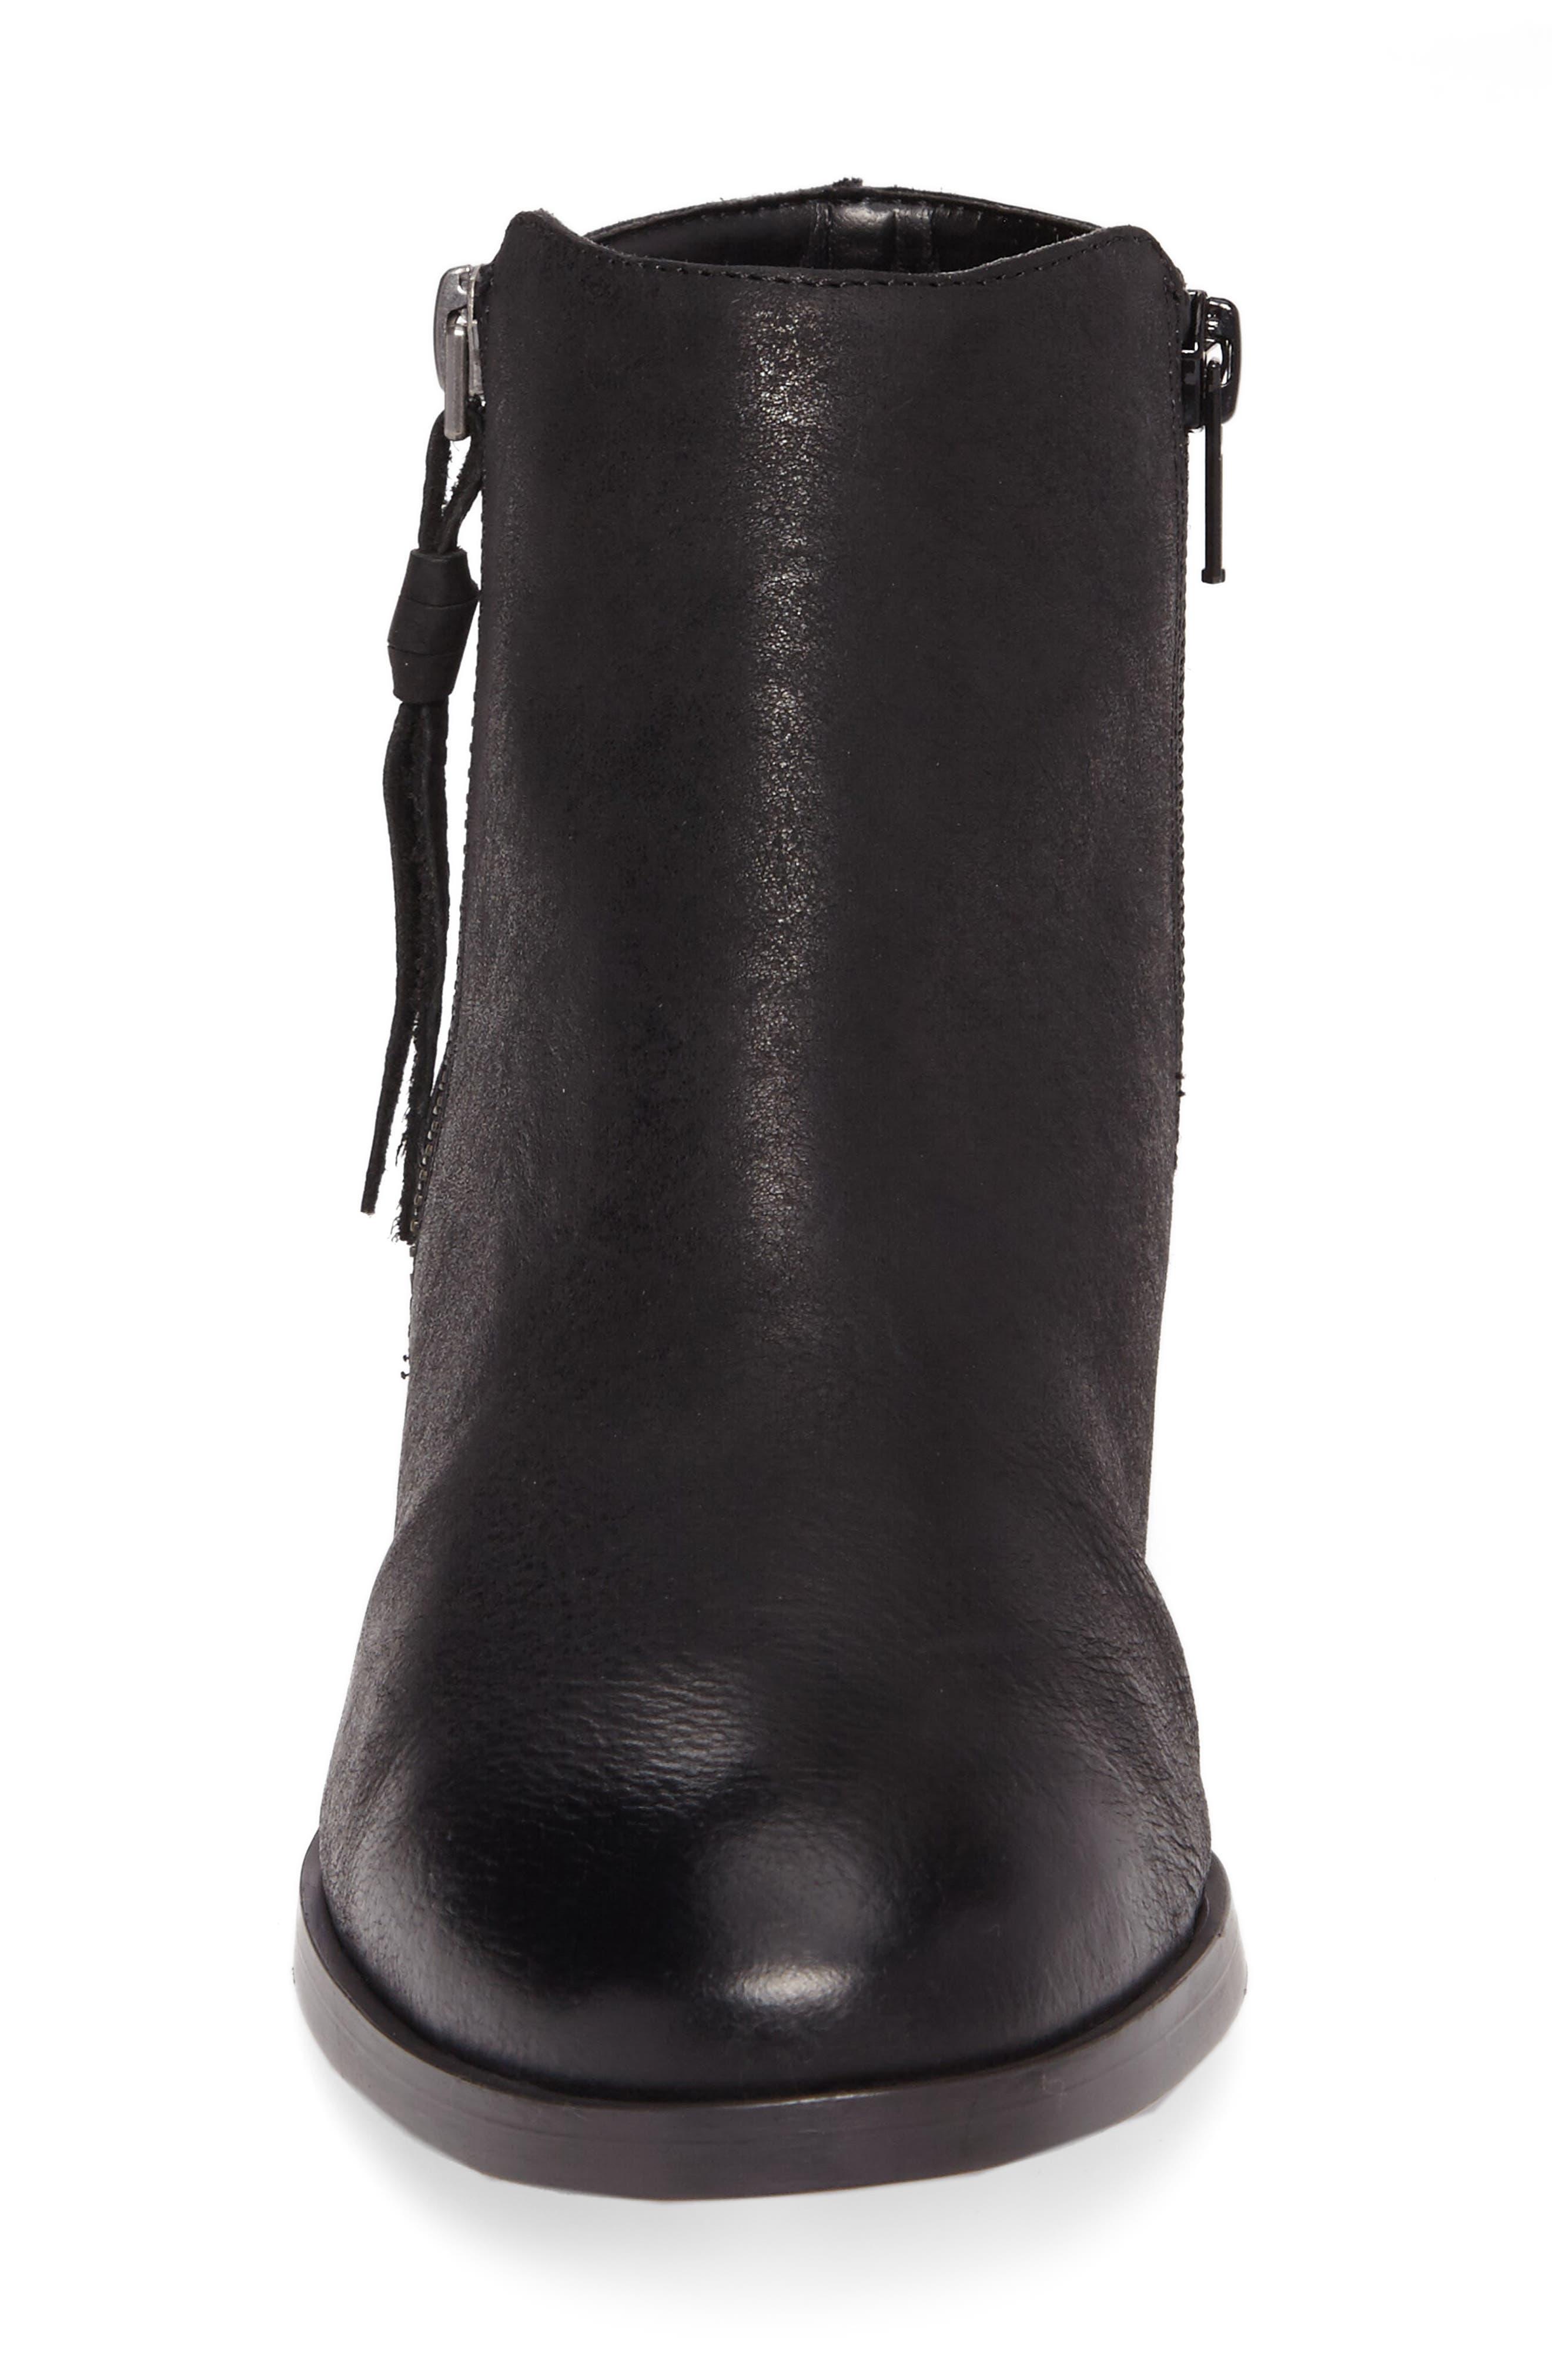 Abbott Bootie,                             Alternate thumbnail 4, color,                             Black Leather